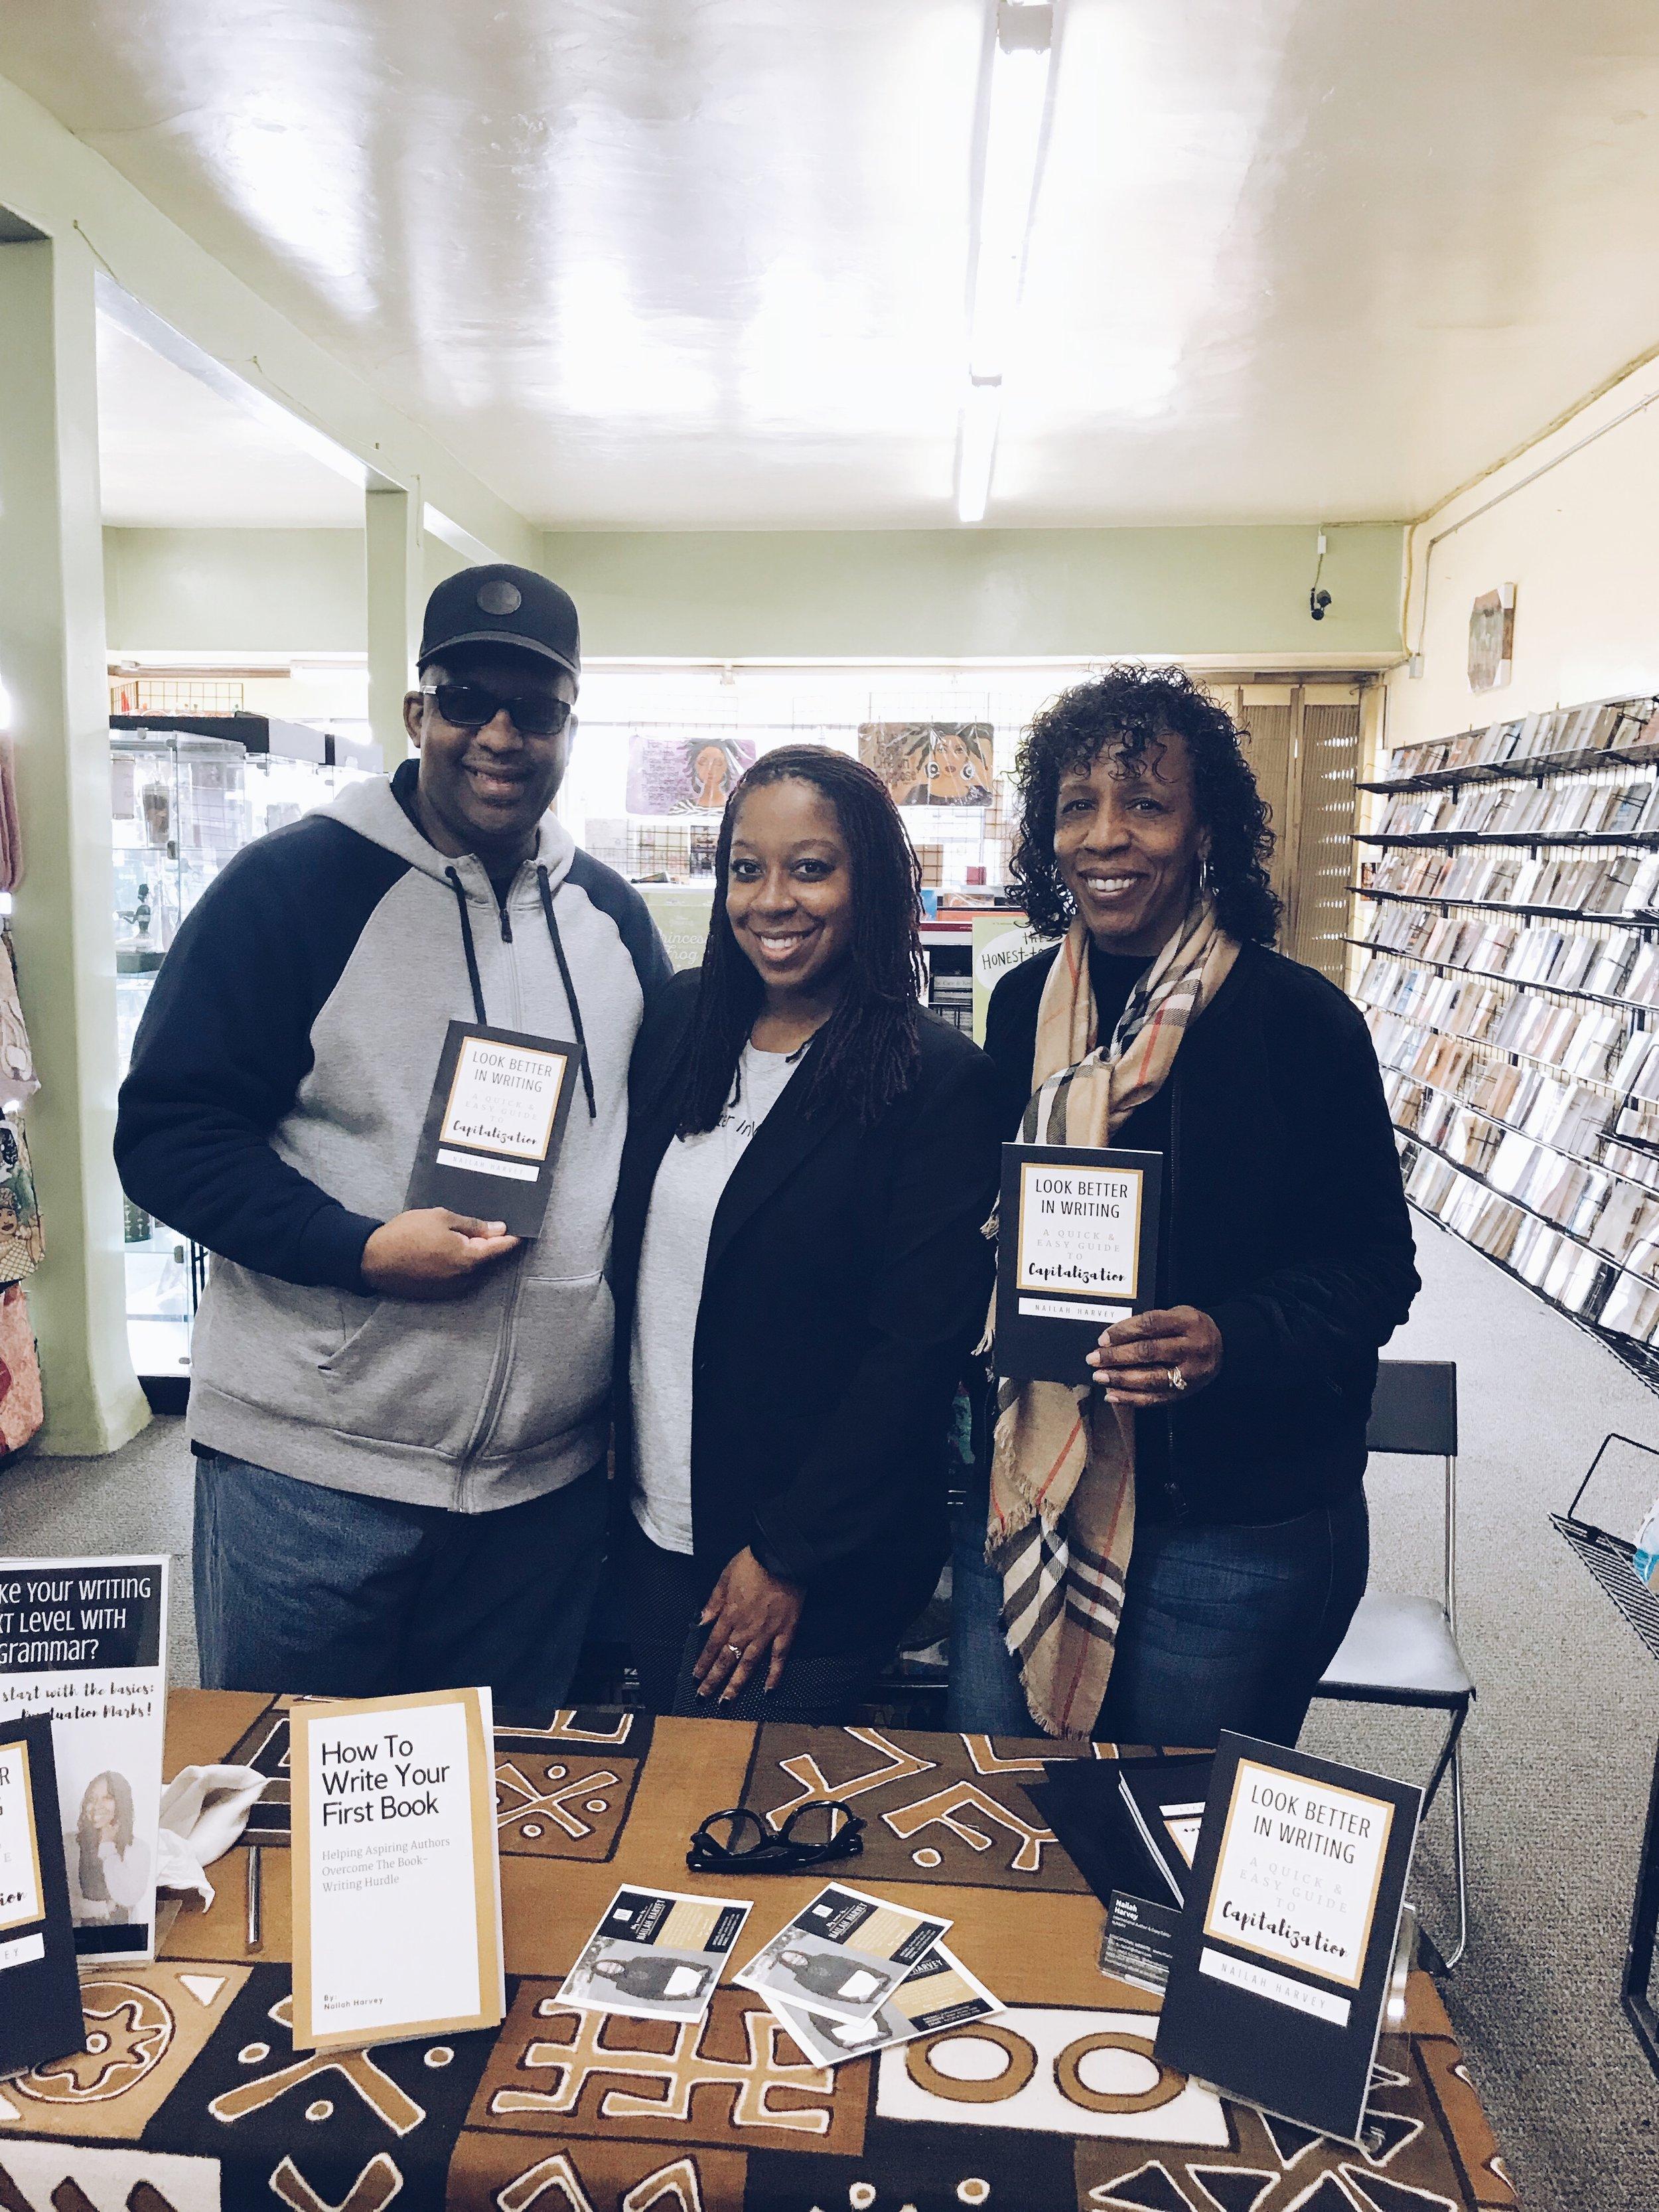 Nailah Harvey Book Signing with Parents.JPG